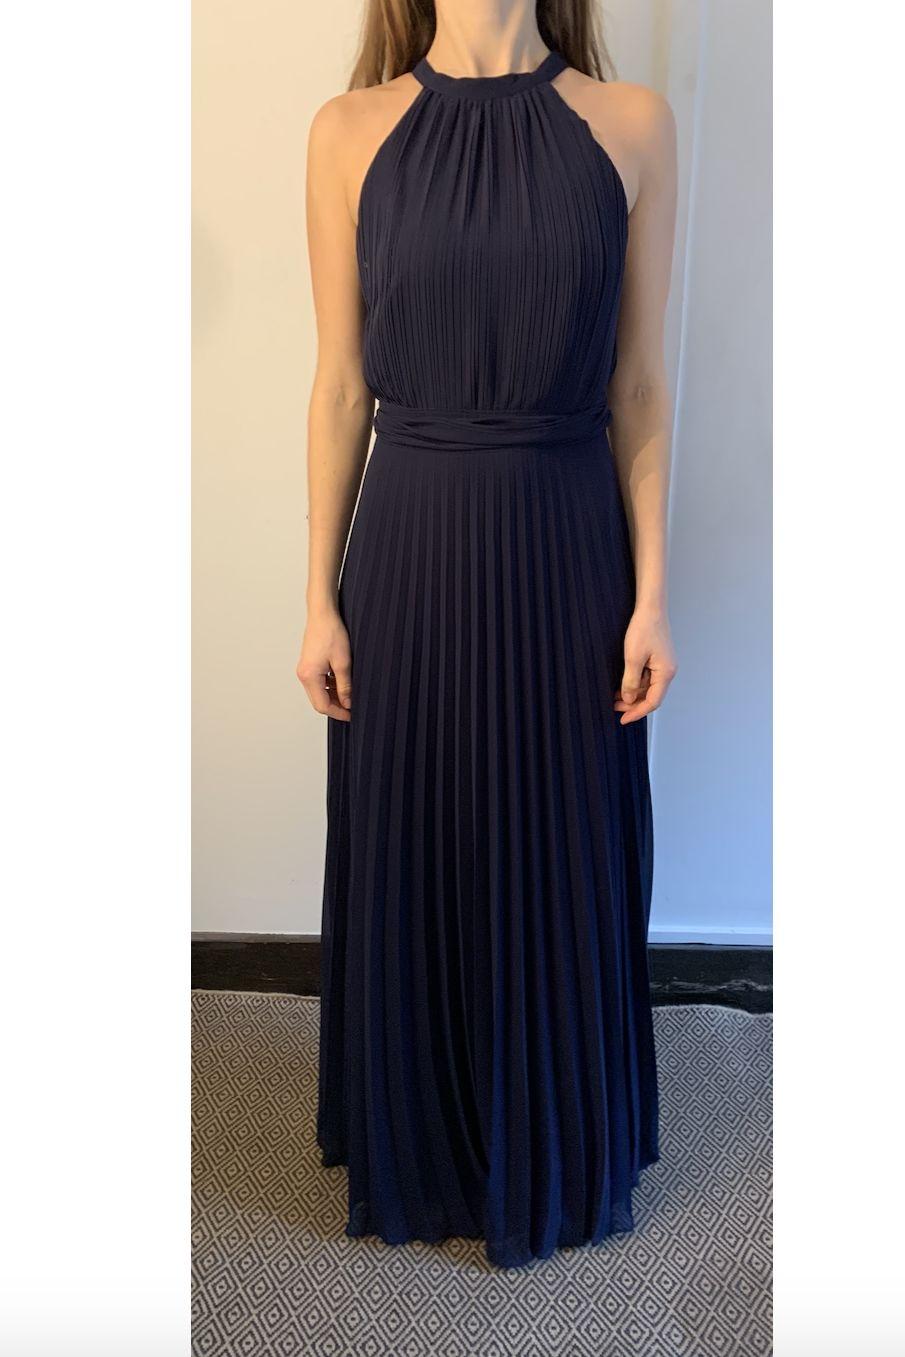 Biba Floor Length Evening Gown 5 Preview Images